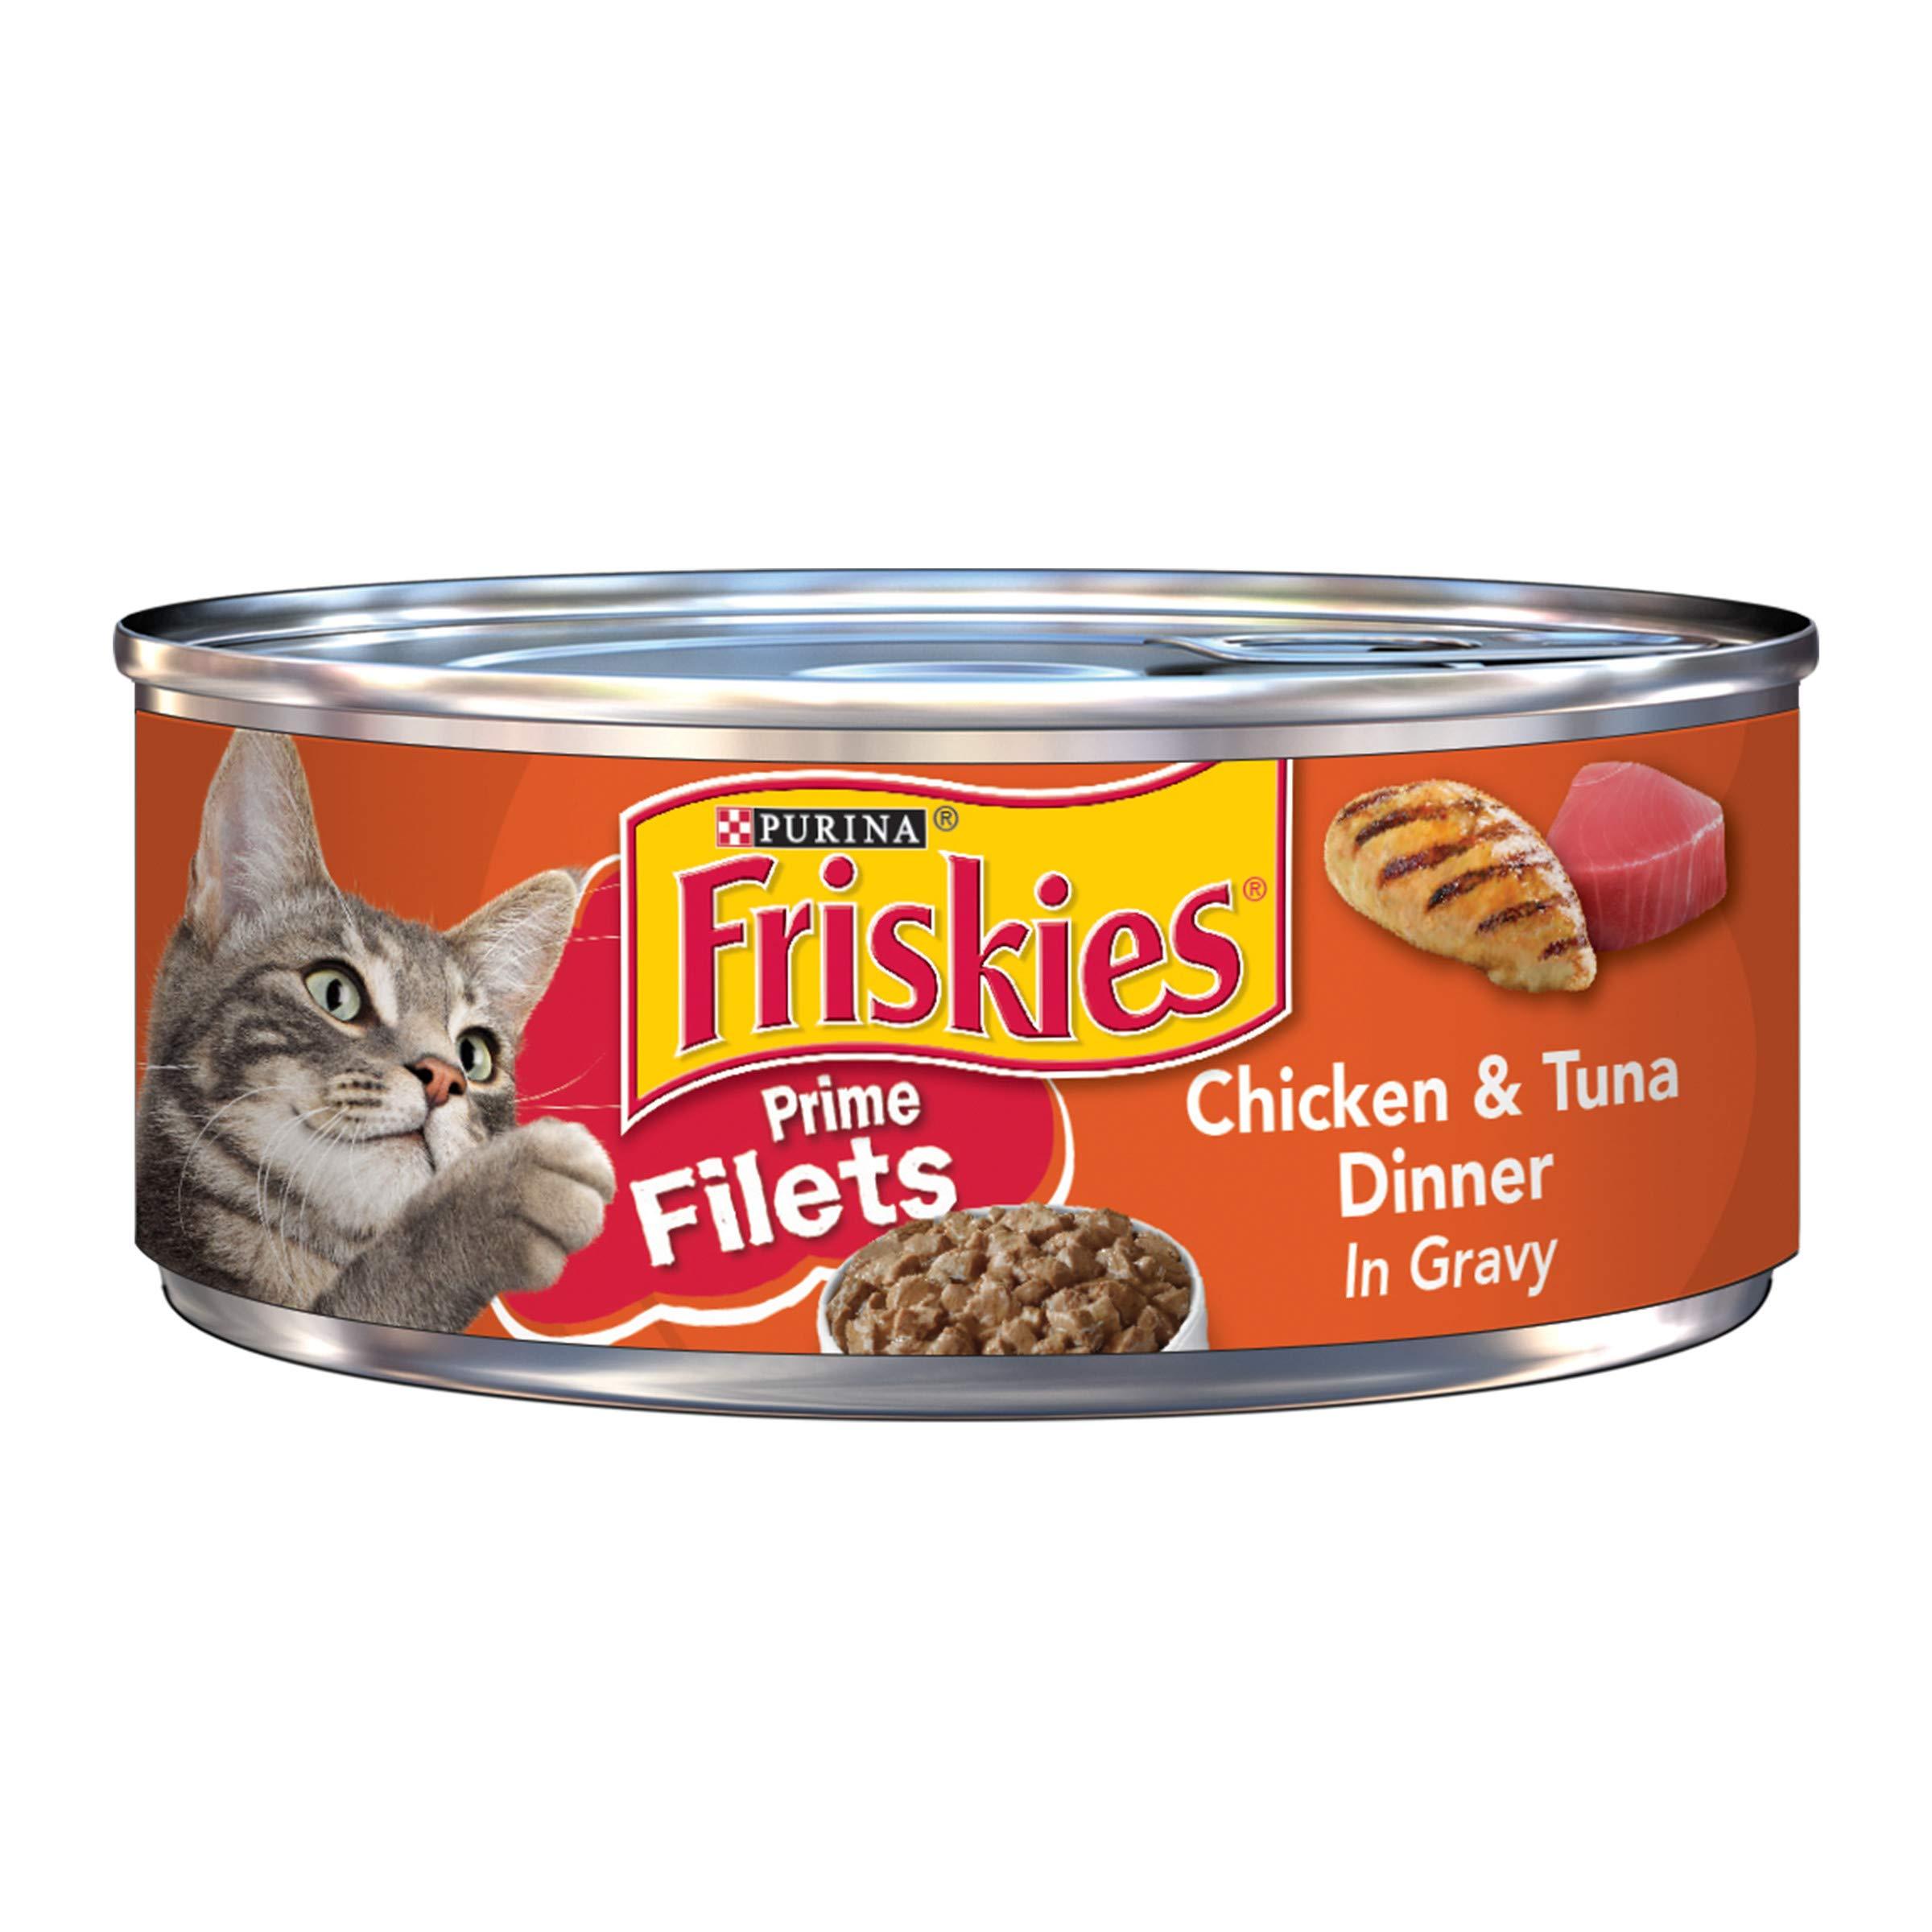 Purina Friskies Prime Filets Chicken & Tuna Dinner in Gravy Wet Cat Food - 5.5 oz. Can